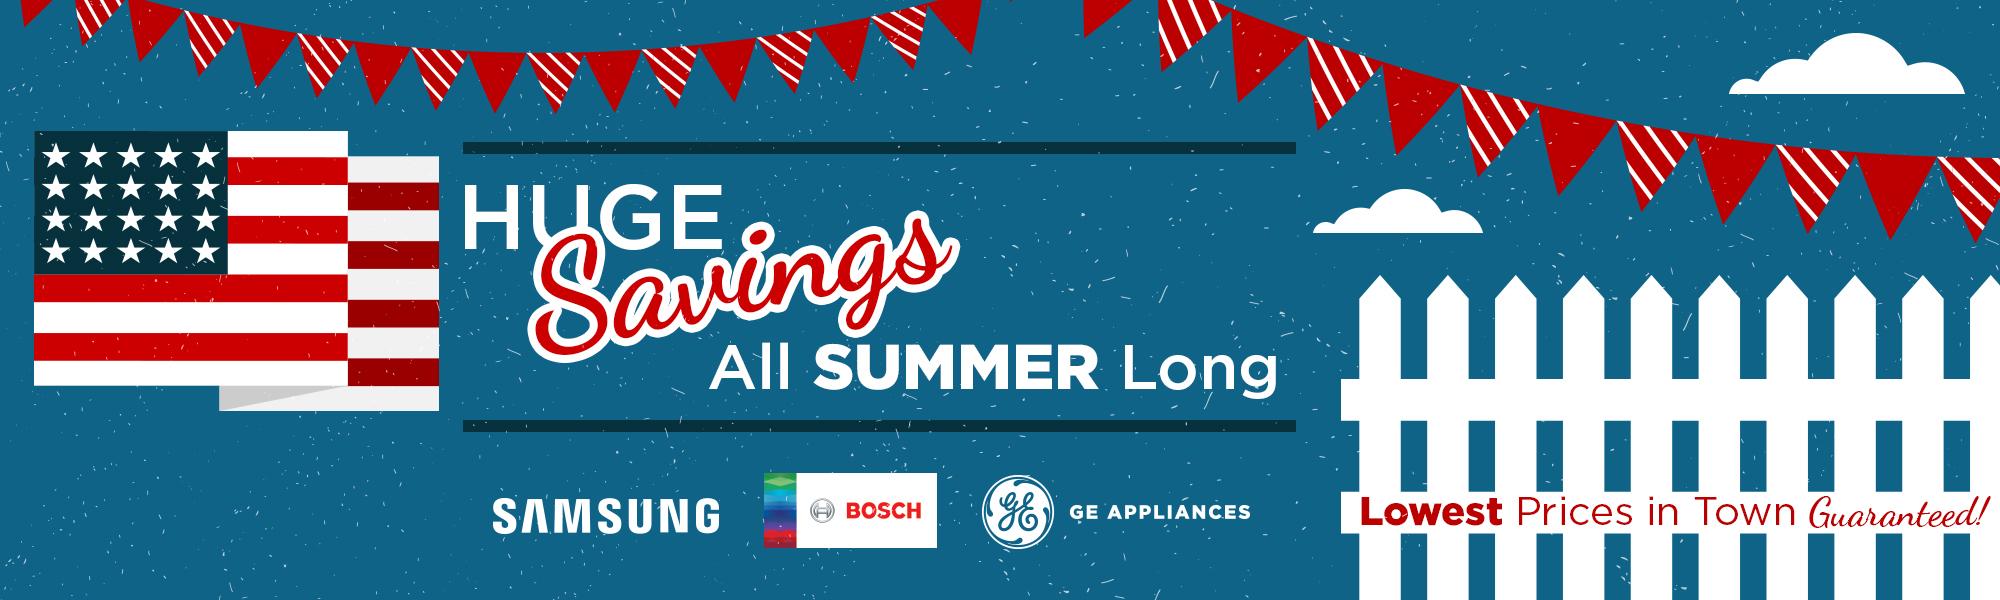 Huge summer savings - GE, Samsung and Bosch